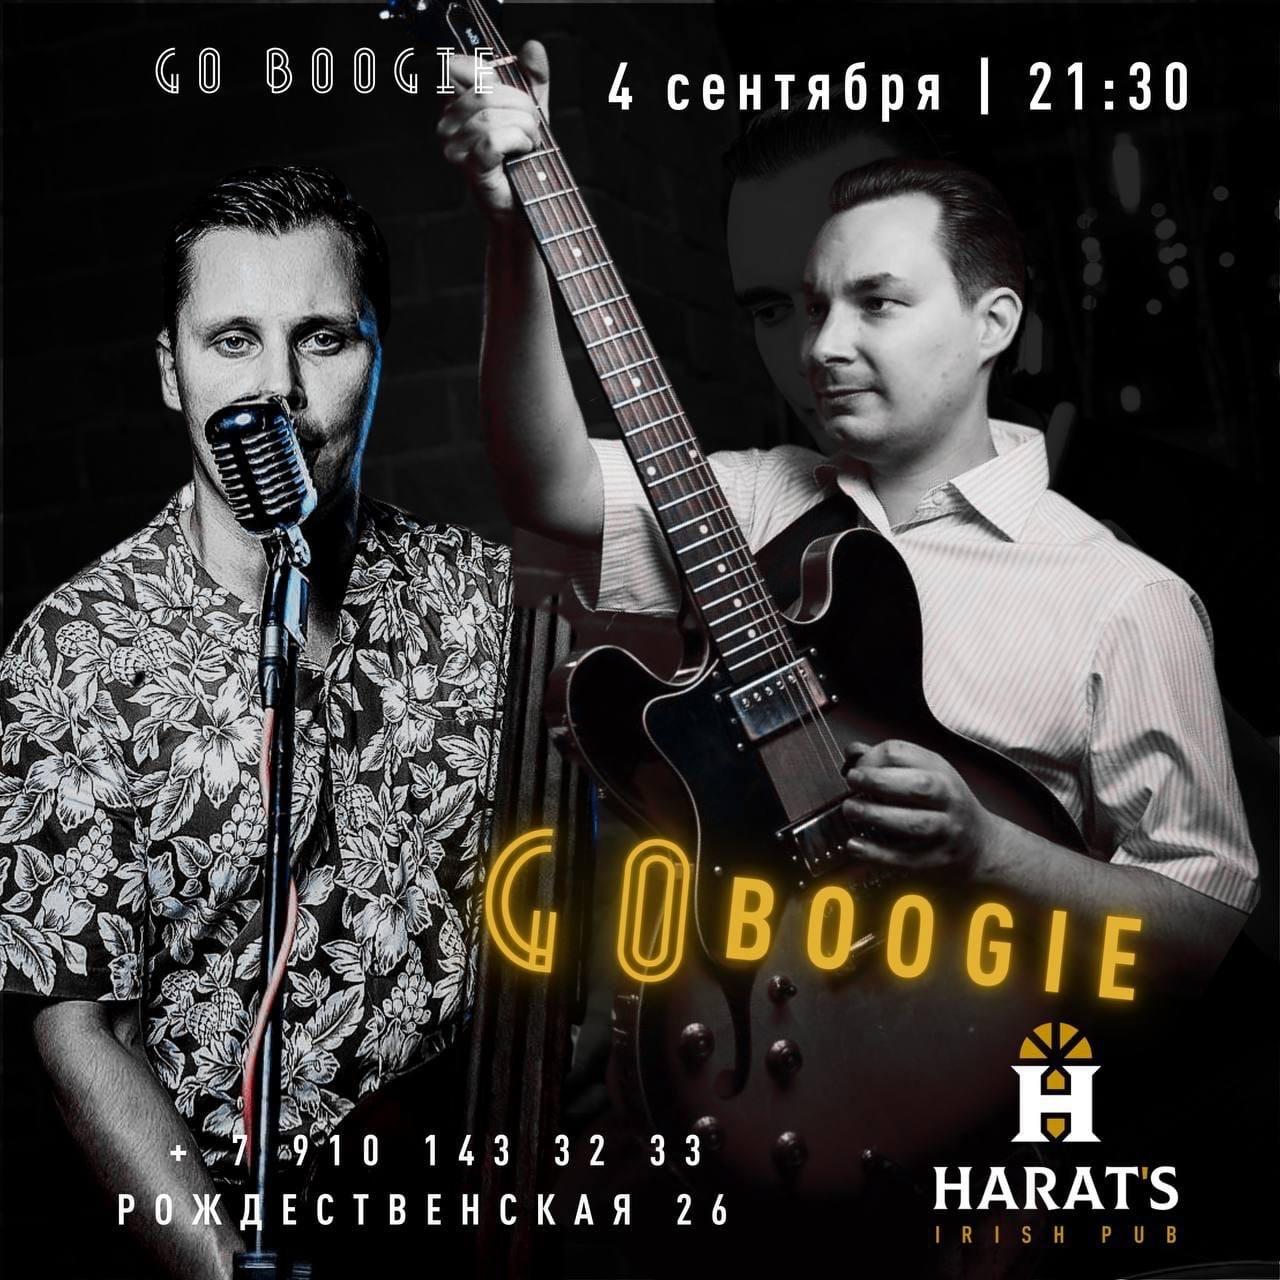 04.09 Go Boogie в пабе Harat's!